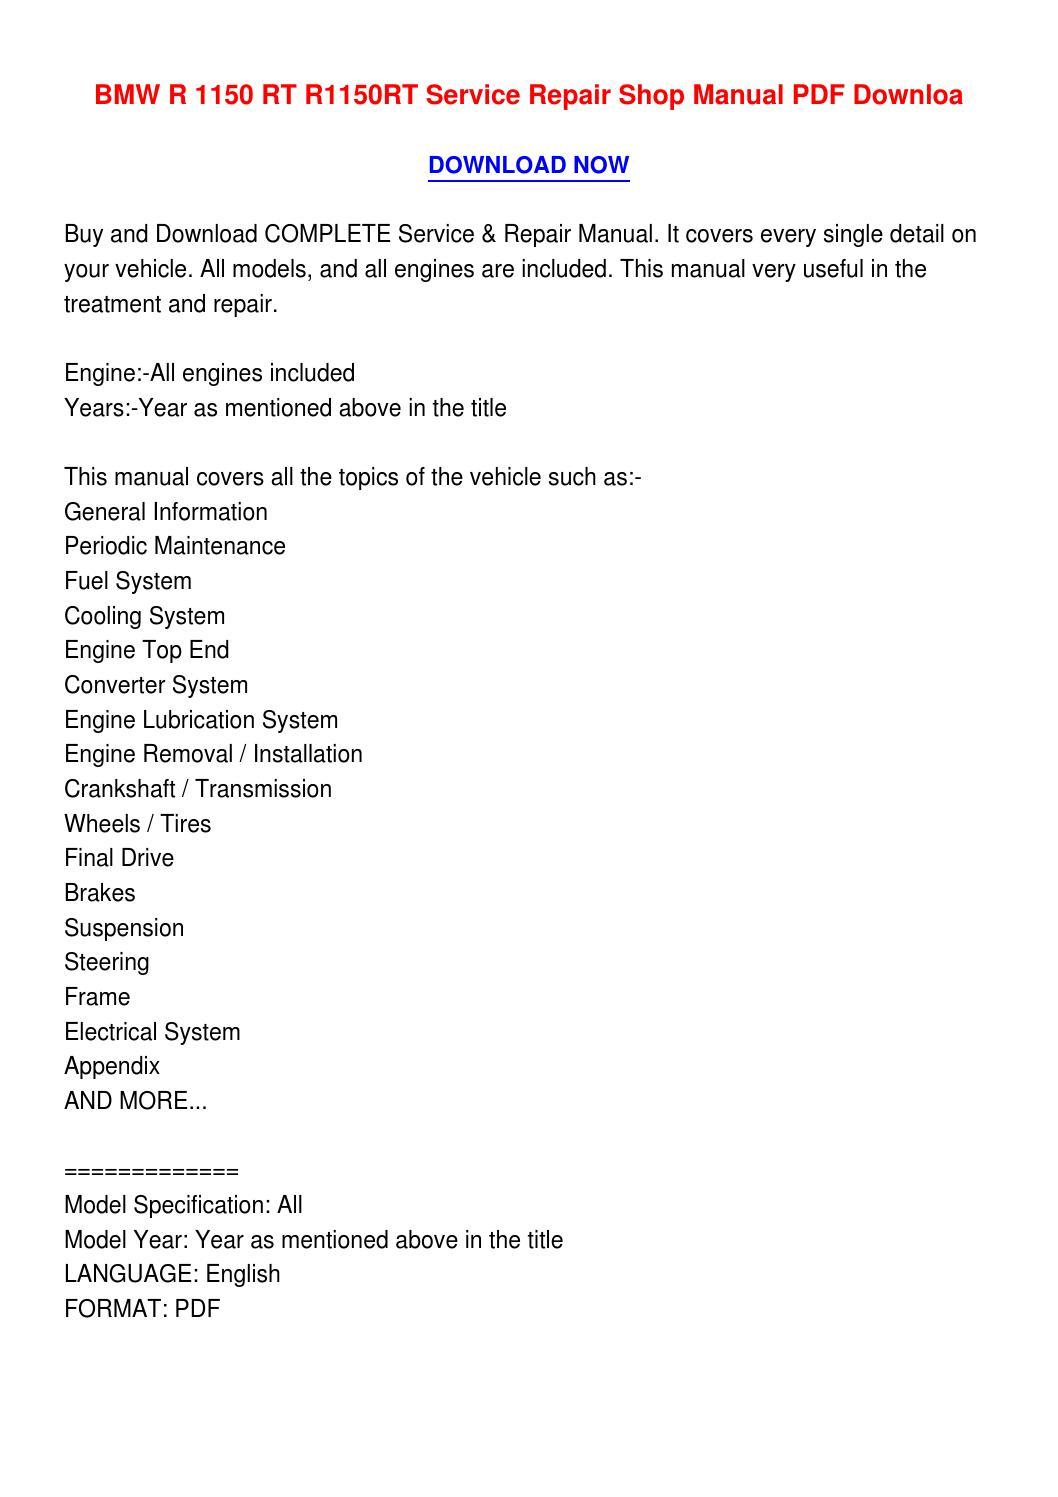 hight resolution of bmw r 1150 rt r1150rt service repair shop manual pdf downloa4 by catherinemonsonvhav issuu